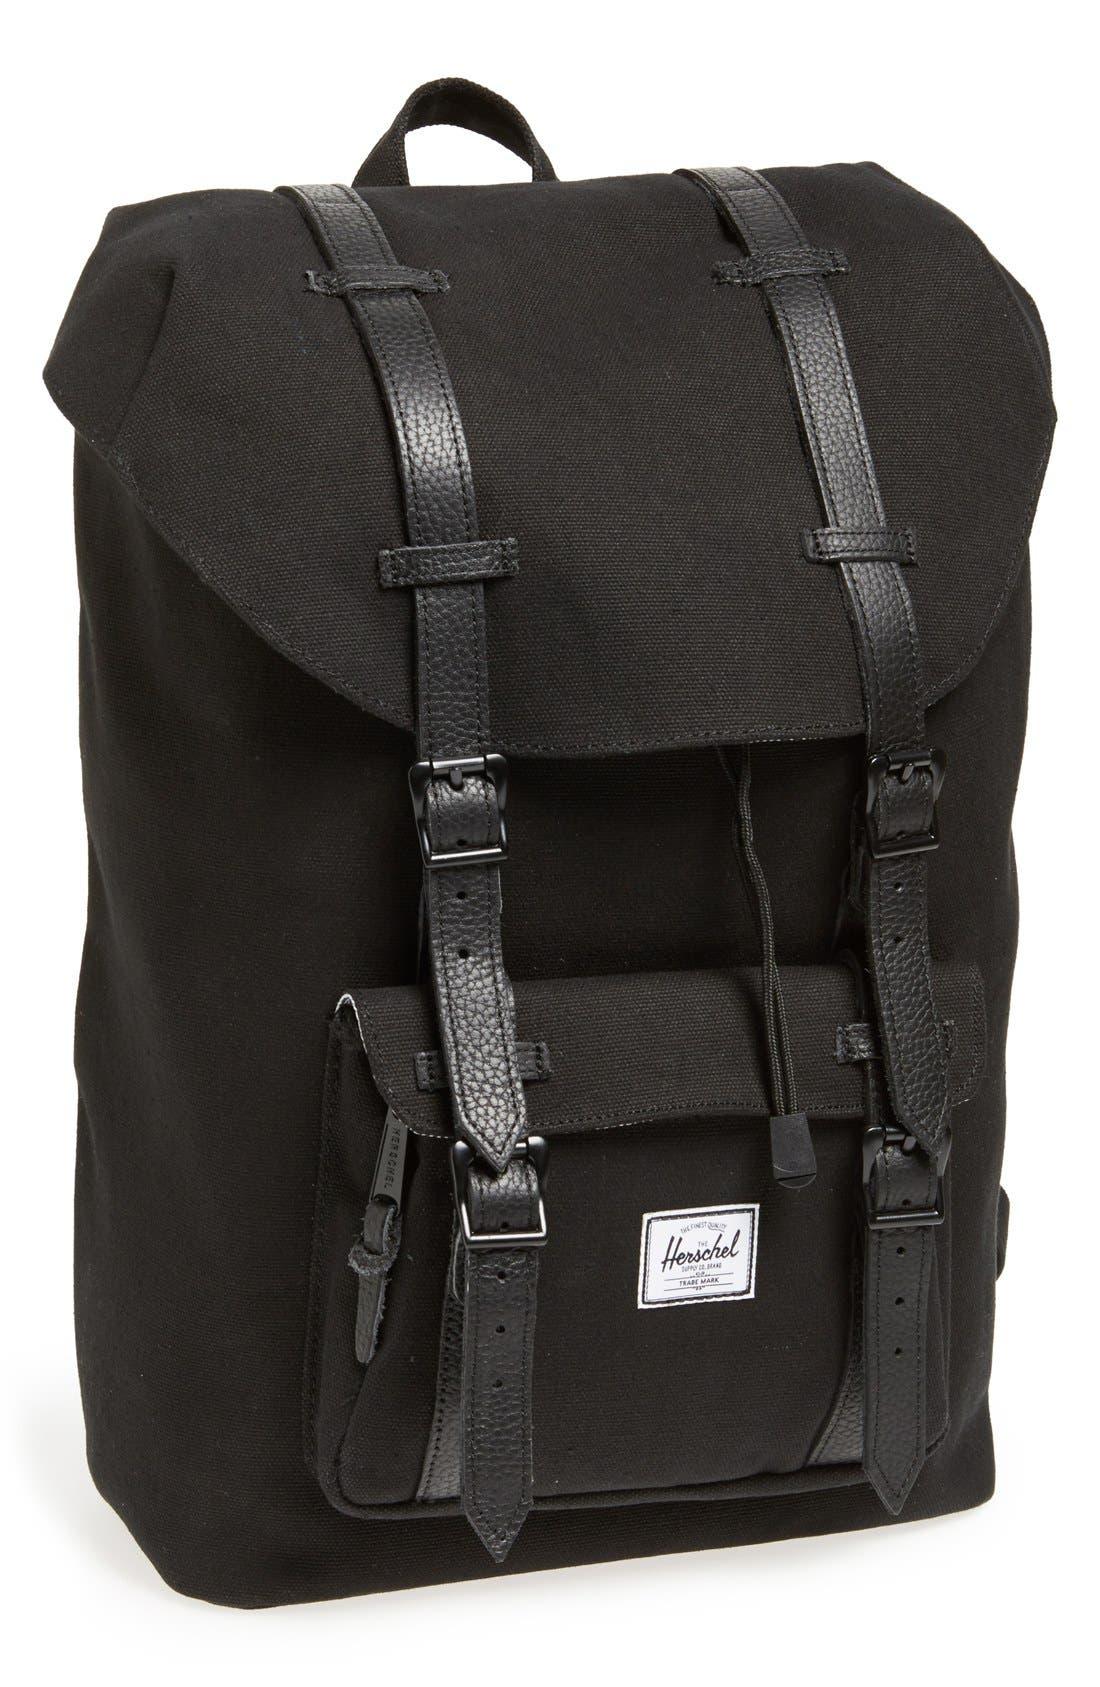 Alternate Image 1 Selected - Herschel Supply Co. 'Little America - Medium' Canvas Backpack